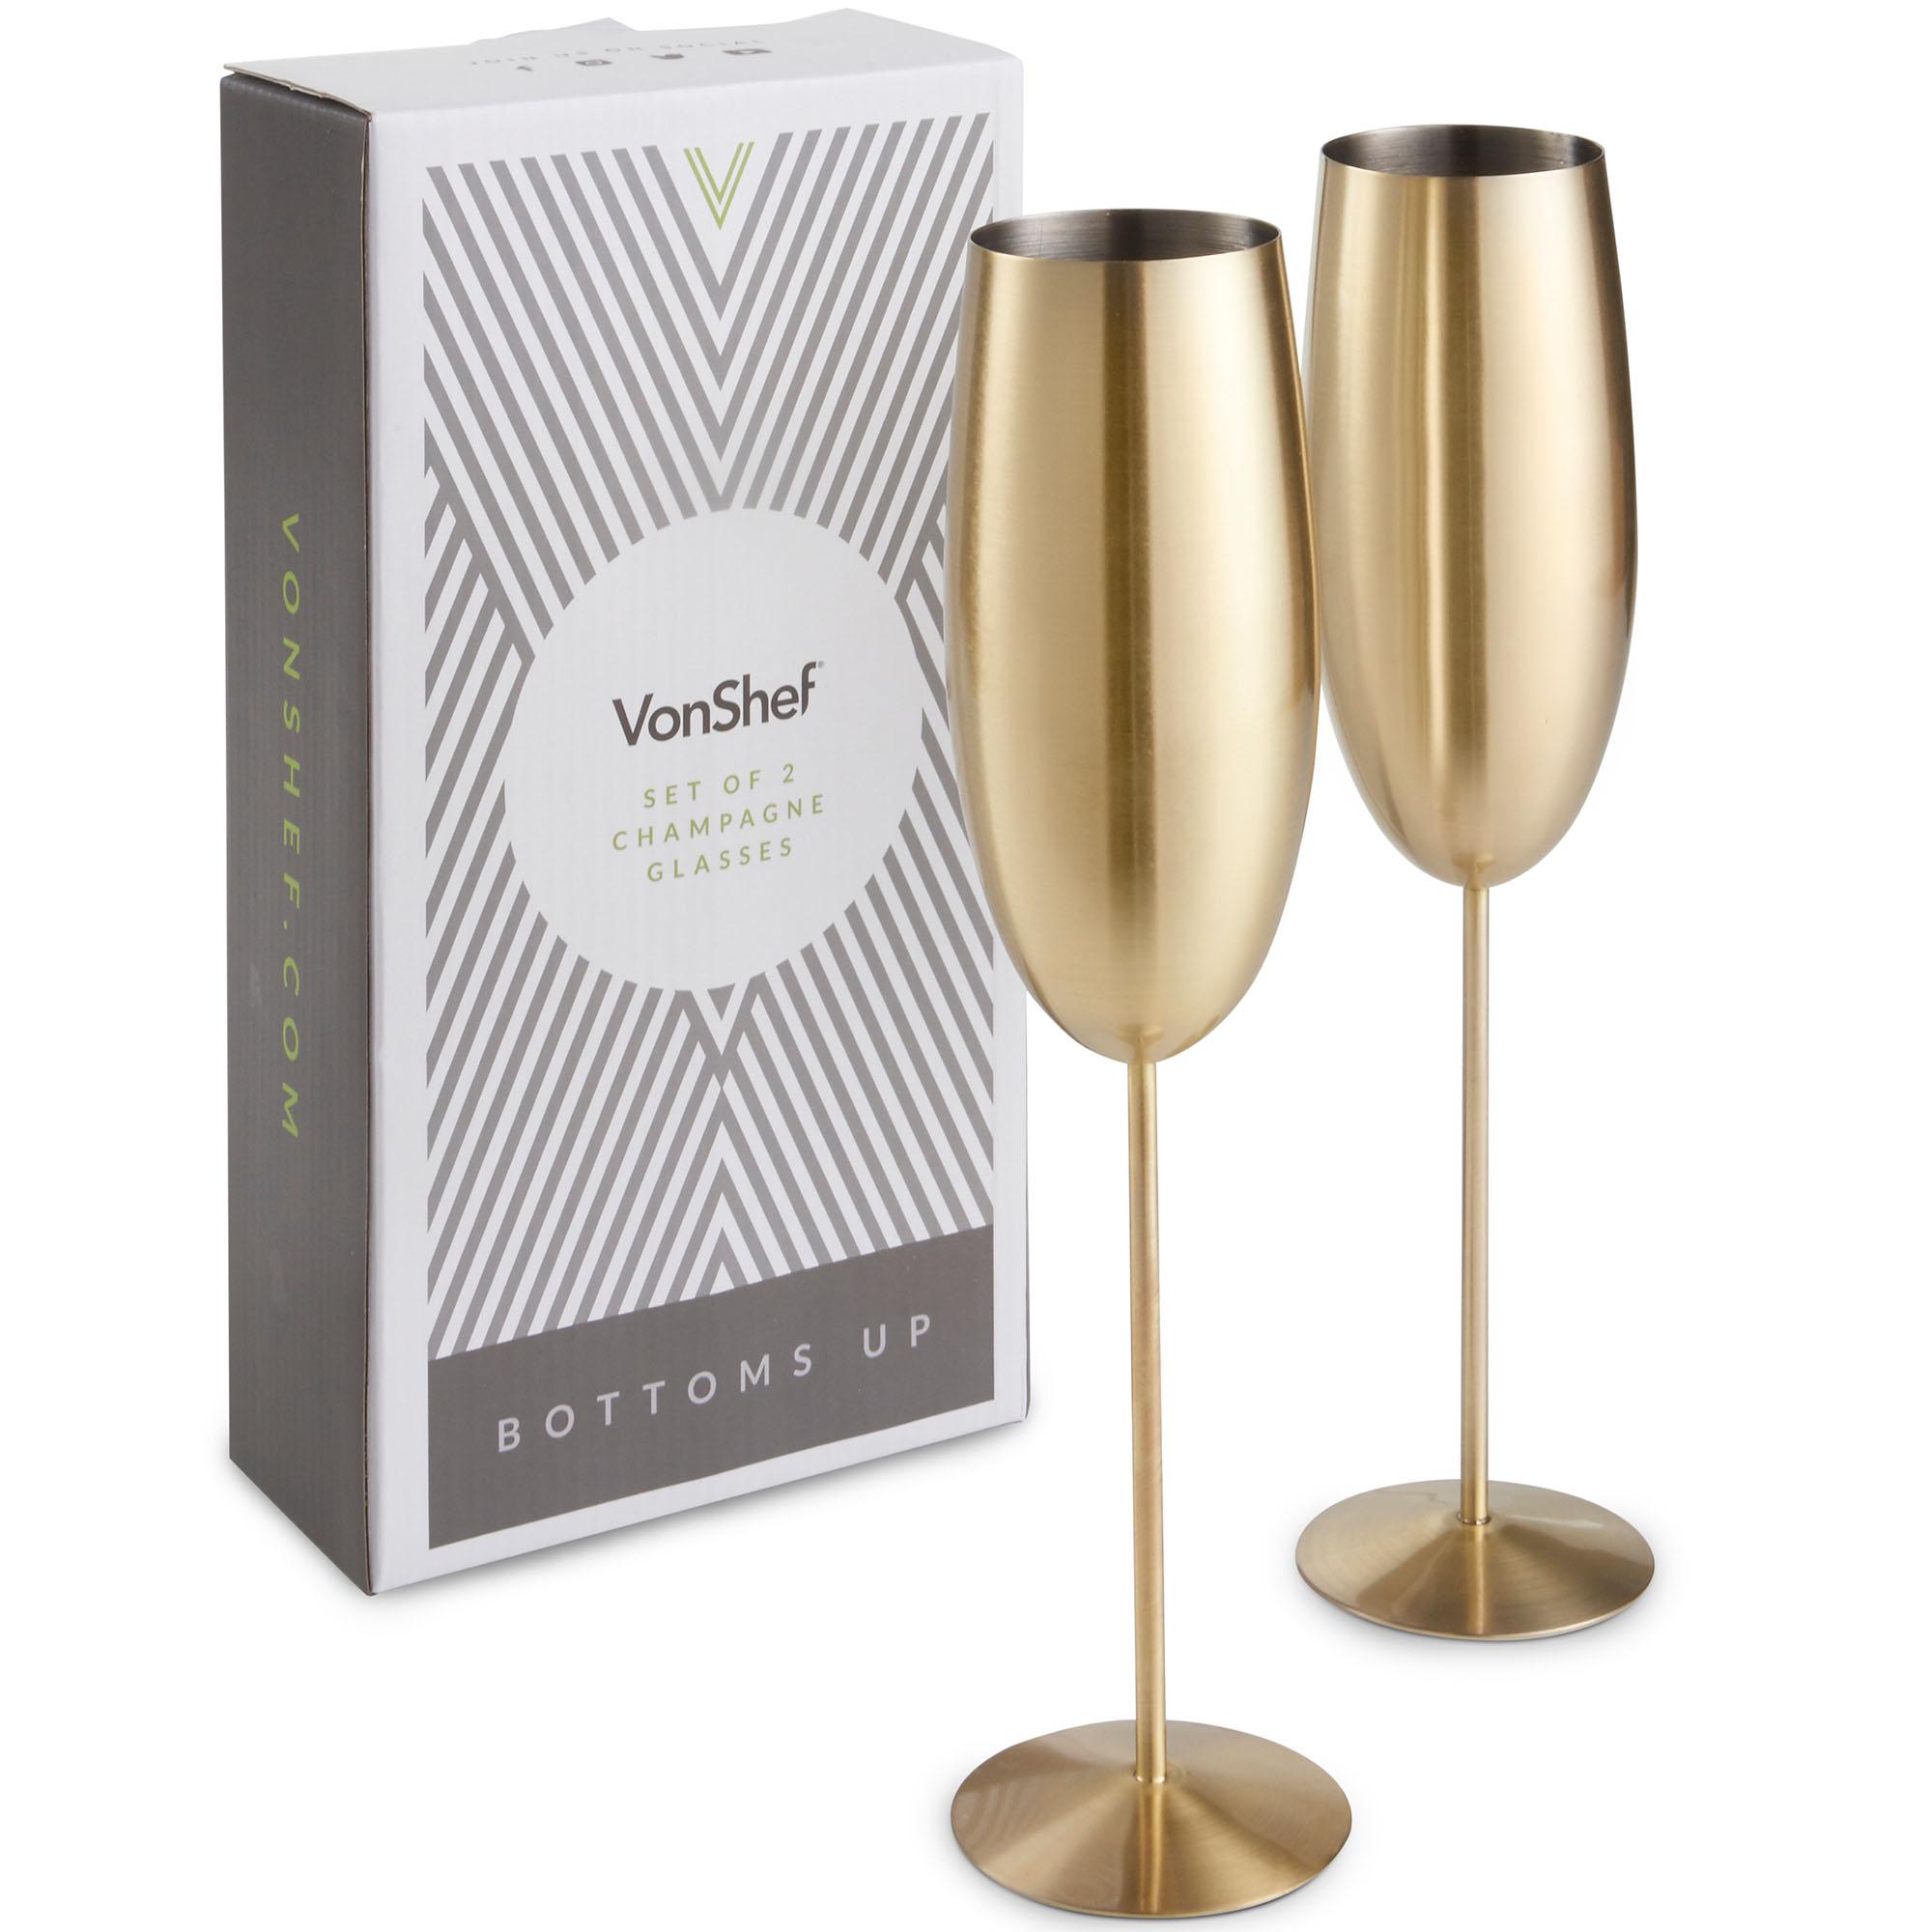 Sentinel Vonshef Champagne Flutes Gles Brushed Gold Shatterproof Stainless Steel Set Of 2